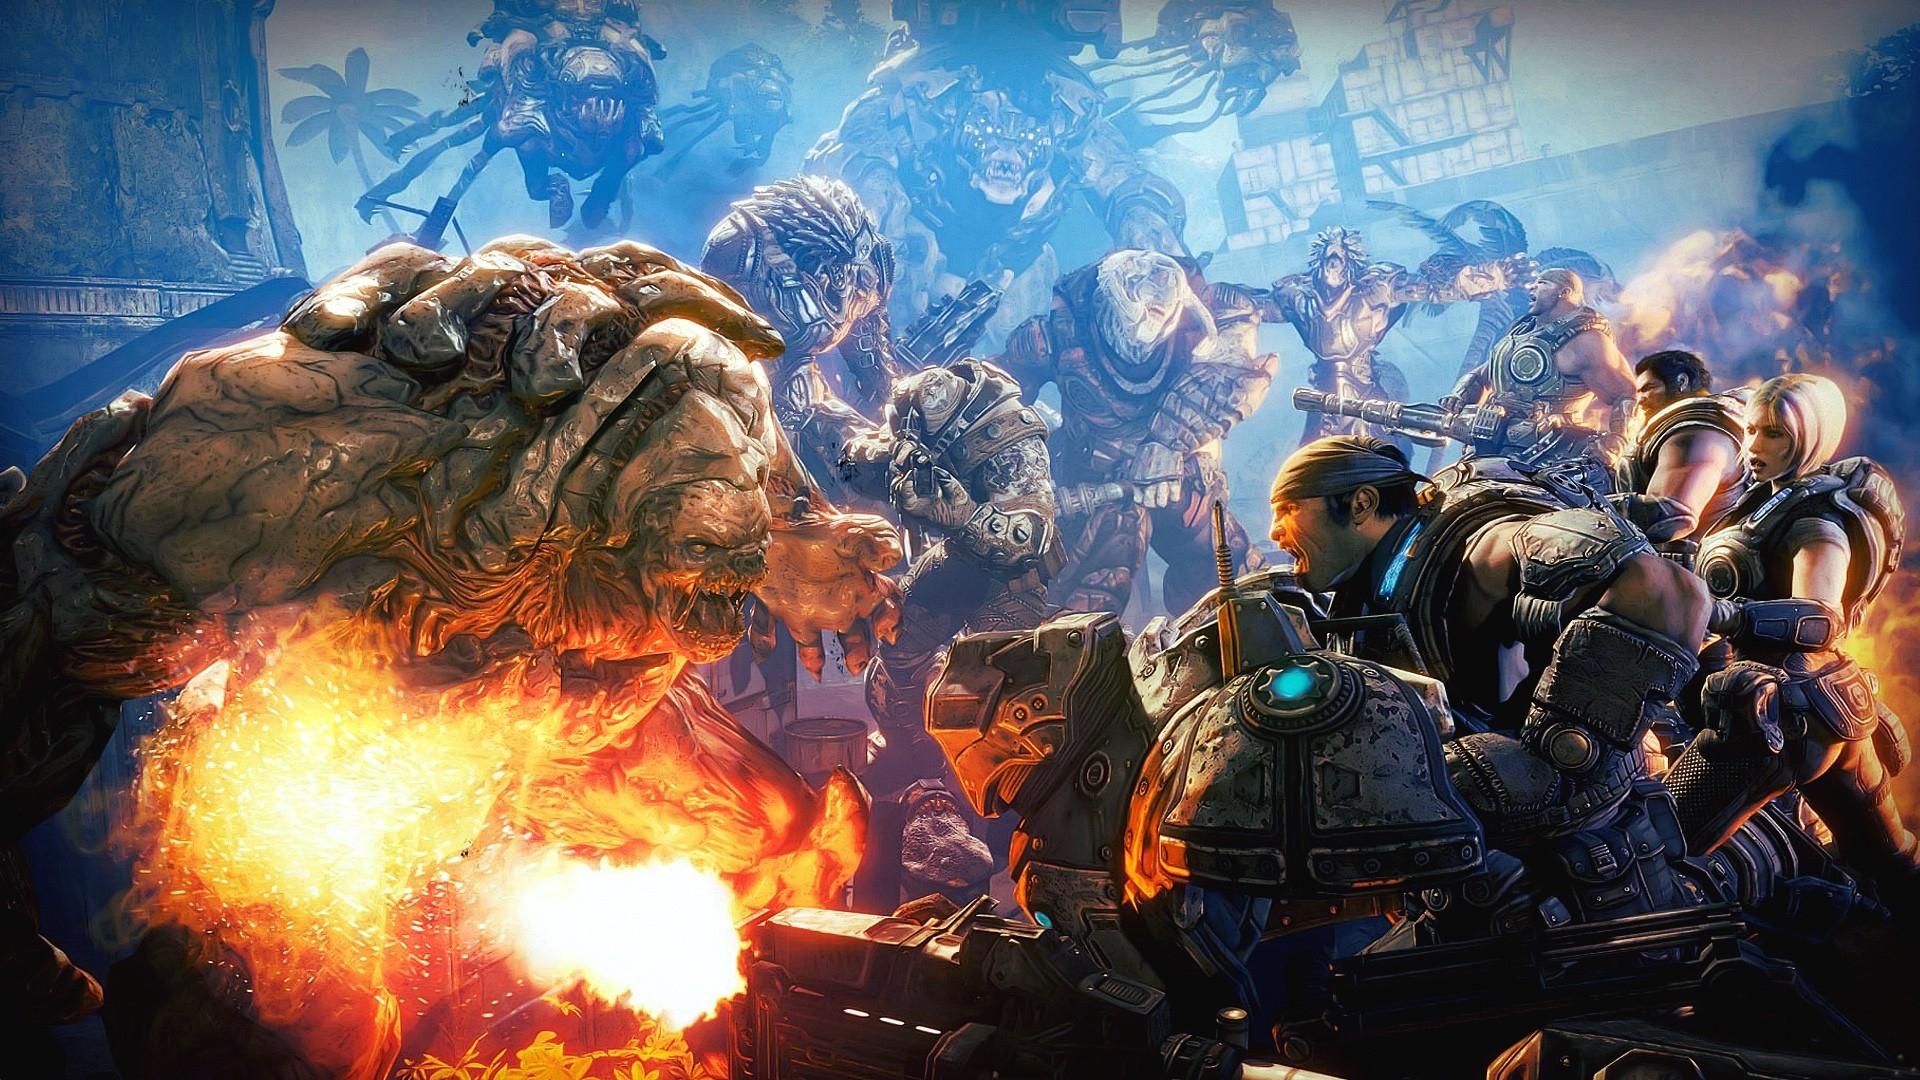 Gears of War monster shooting soldiers Scream Marcus Fenix